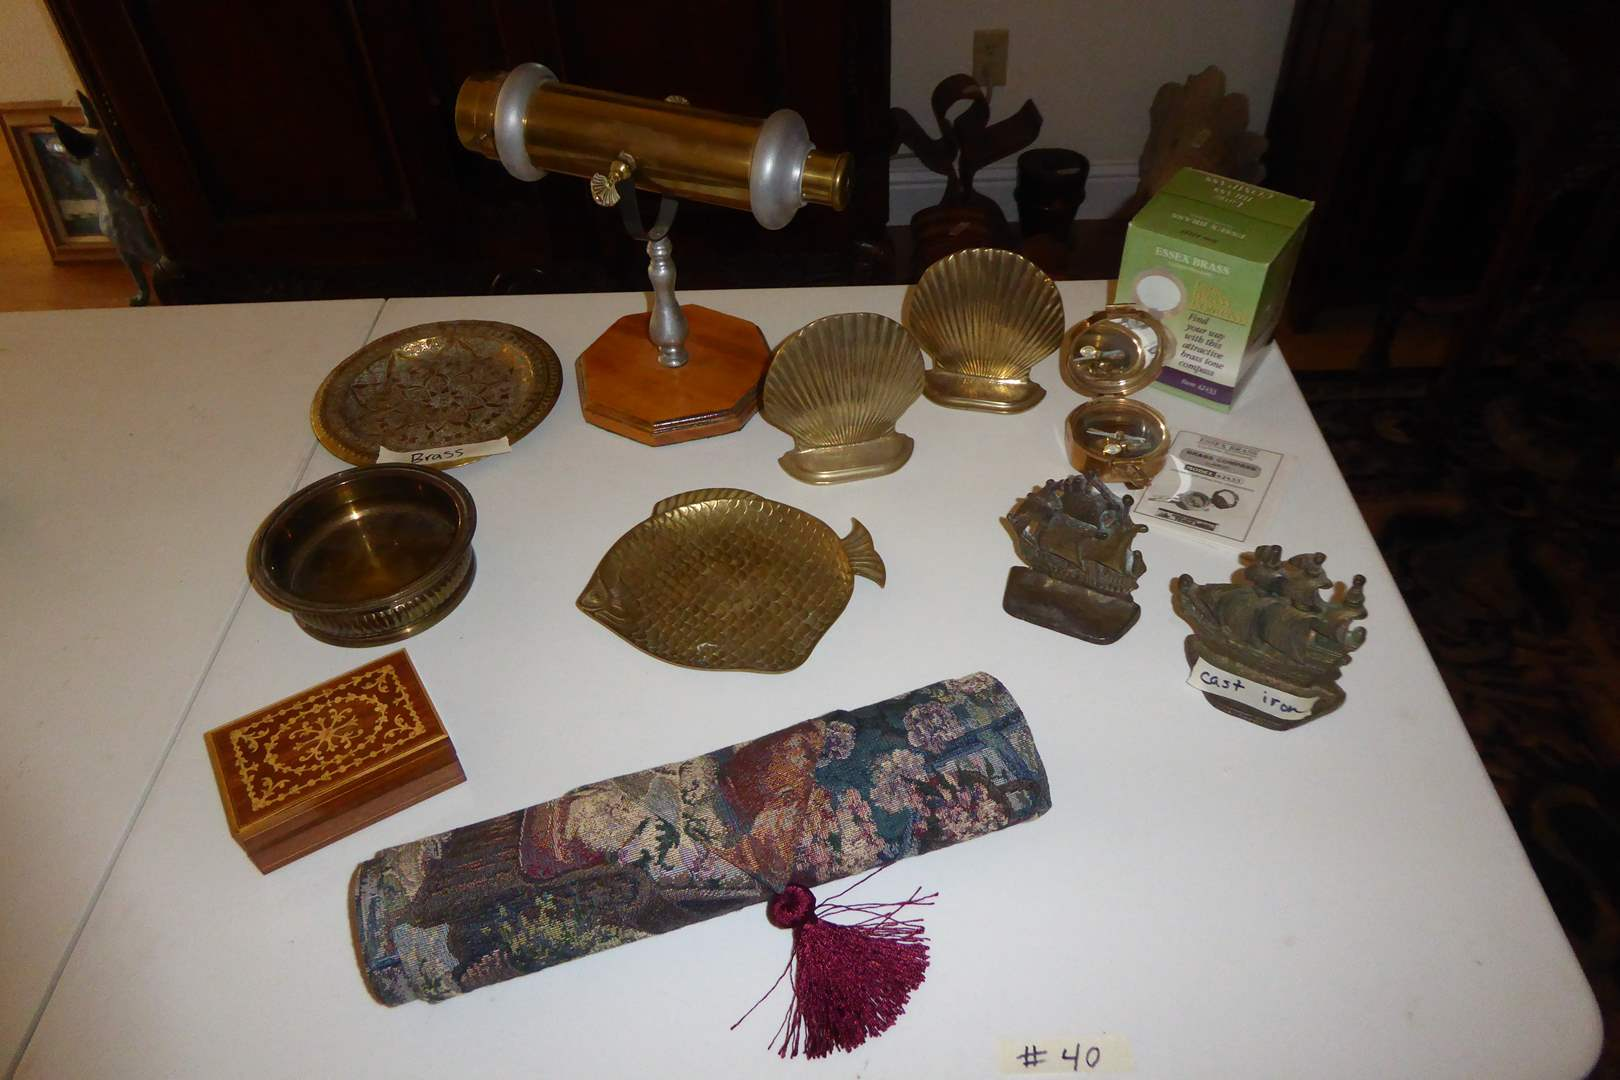 Lot # 40 - Brass Kaleidoscope, Book Ends, Compass & Decorative Plates  (main image)